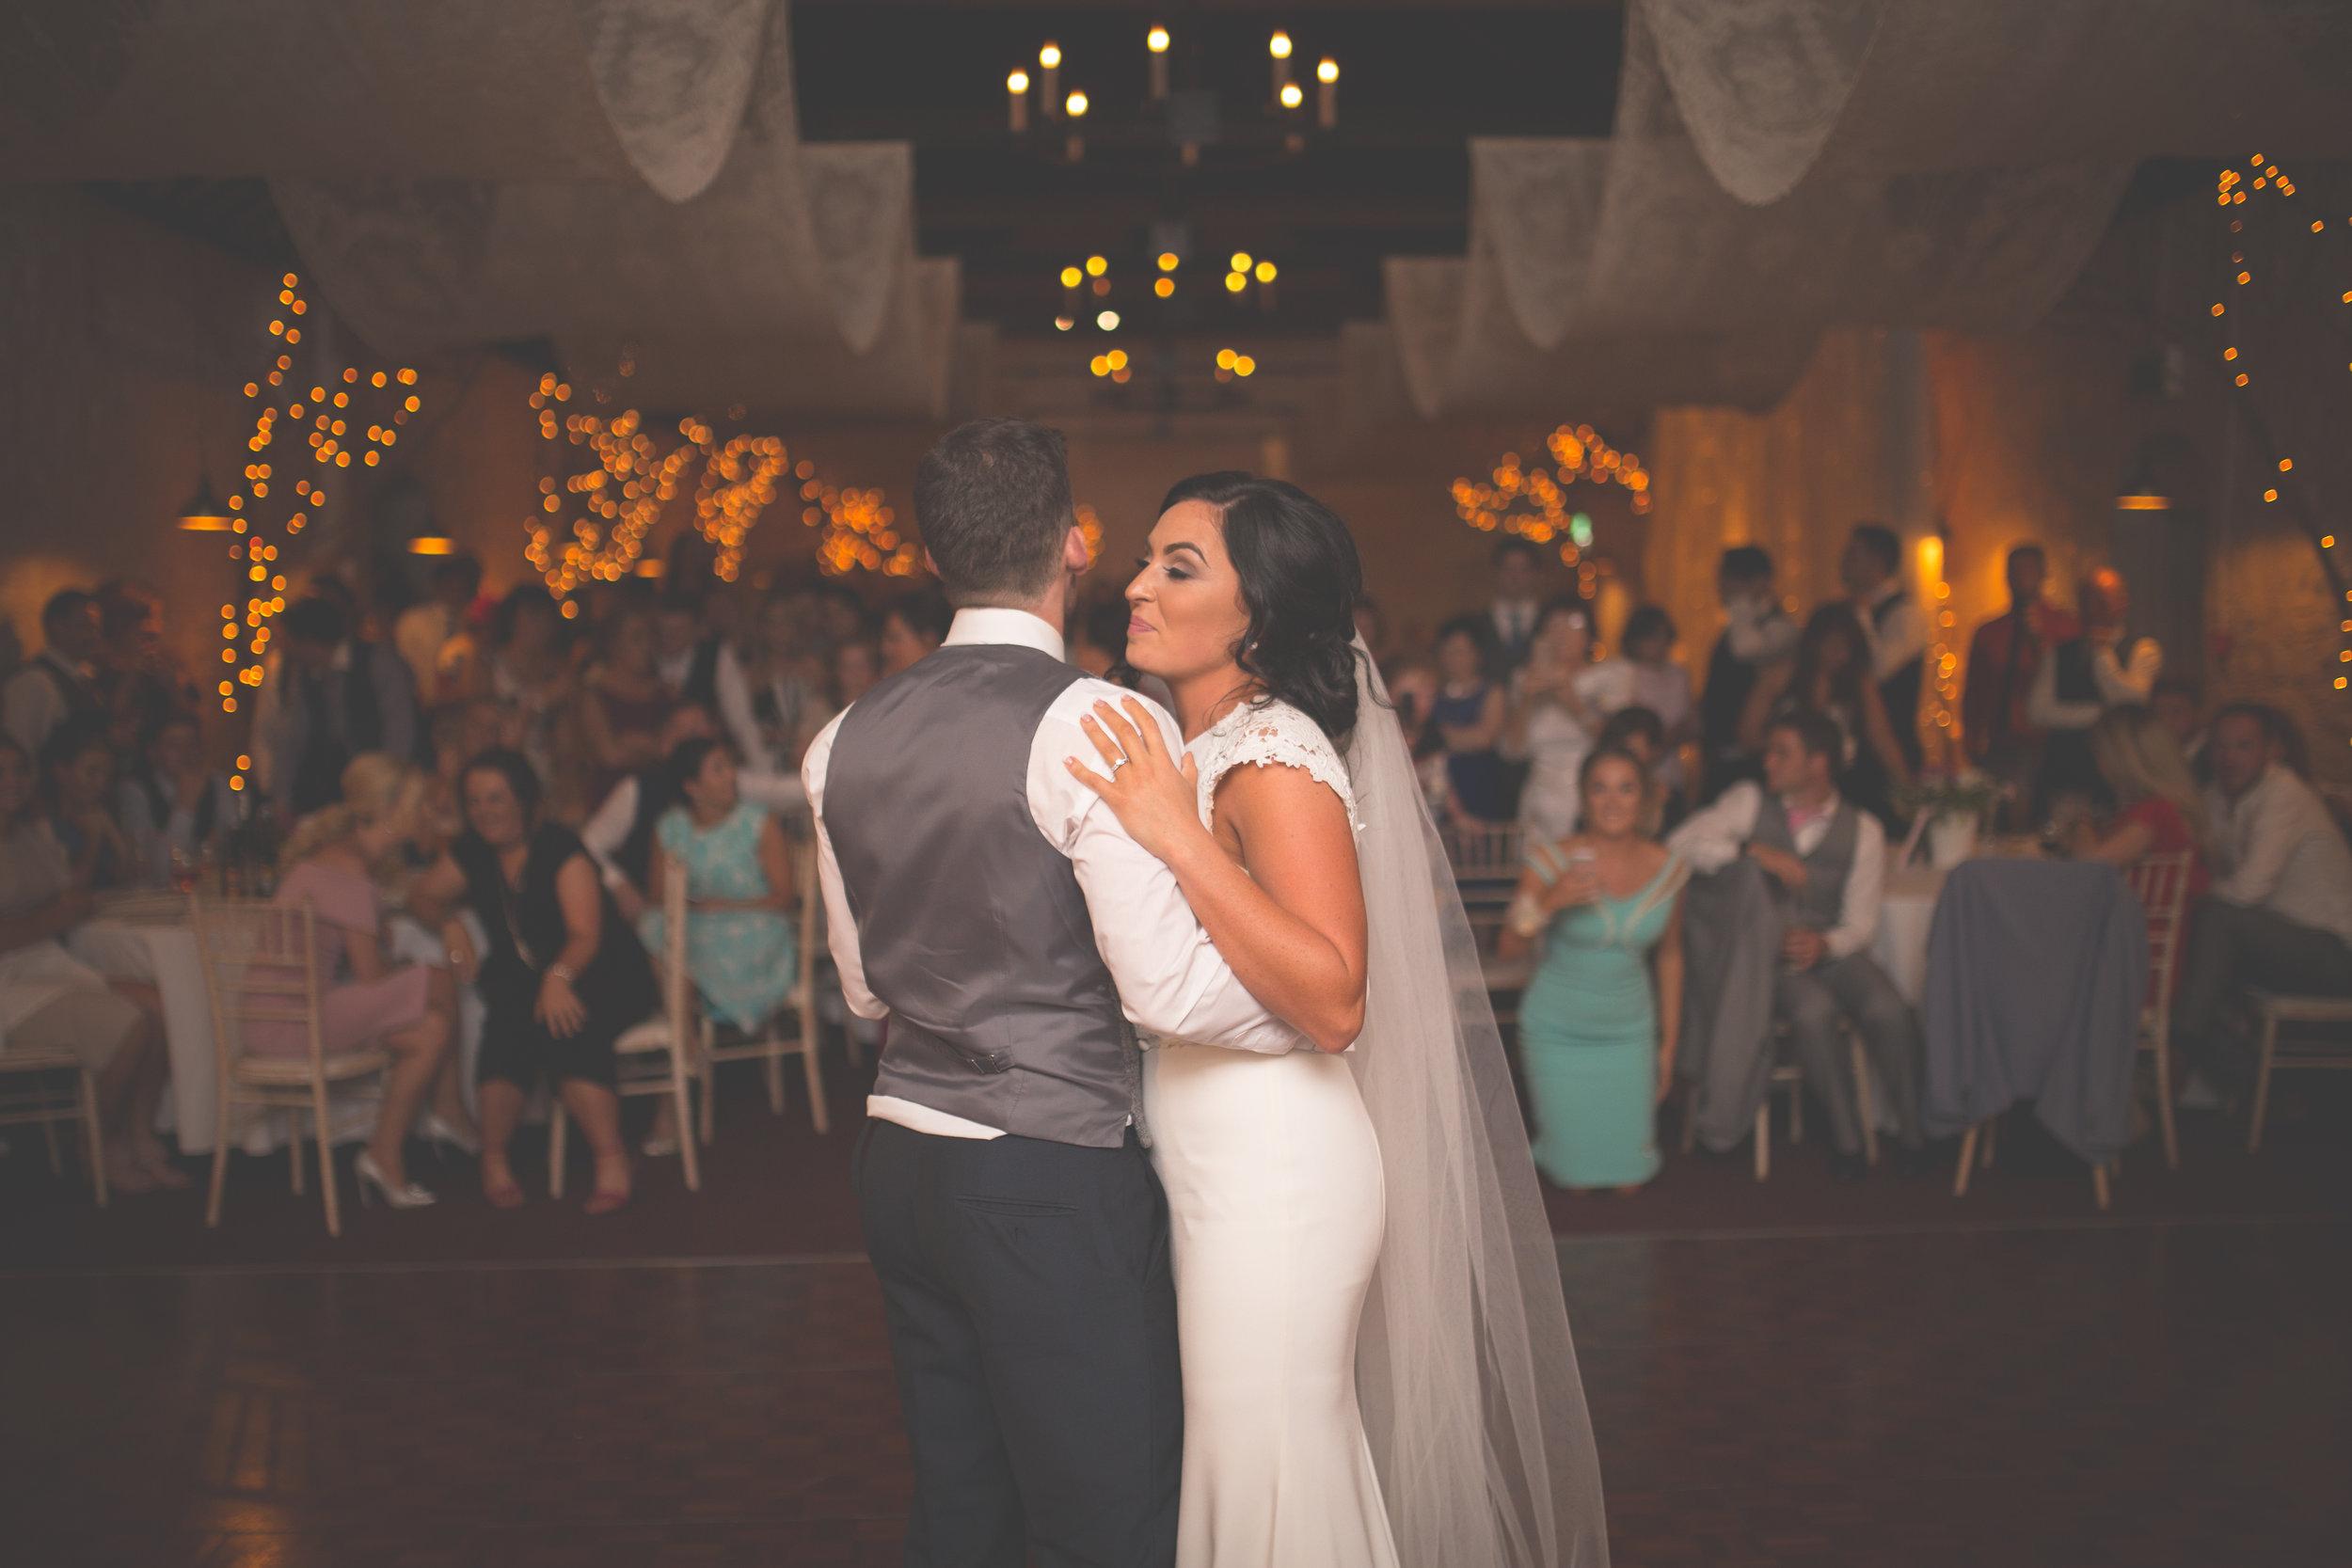 Brian McEwan Wedding Photography | Carol-Annee & Sean | The Dancing-30.jpg